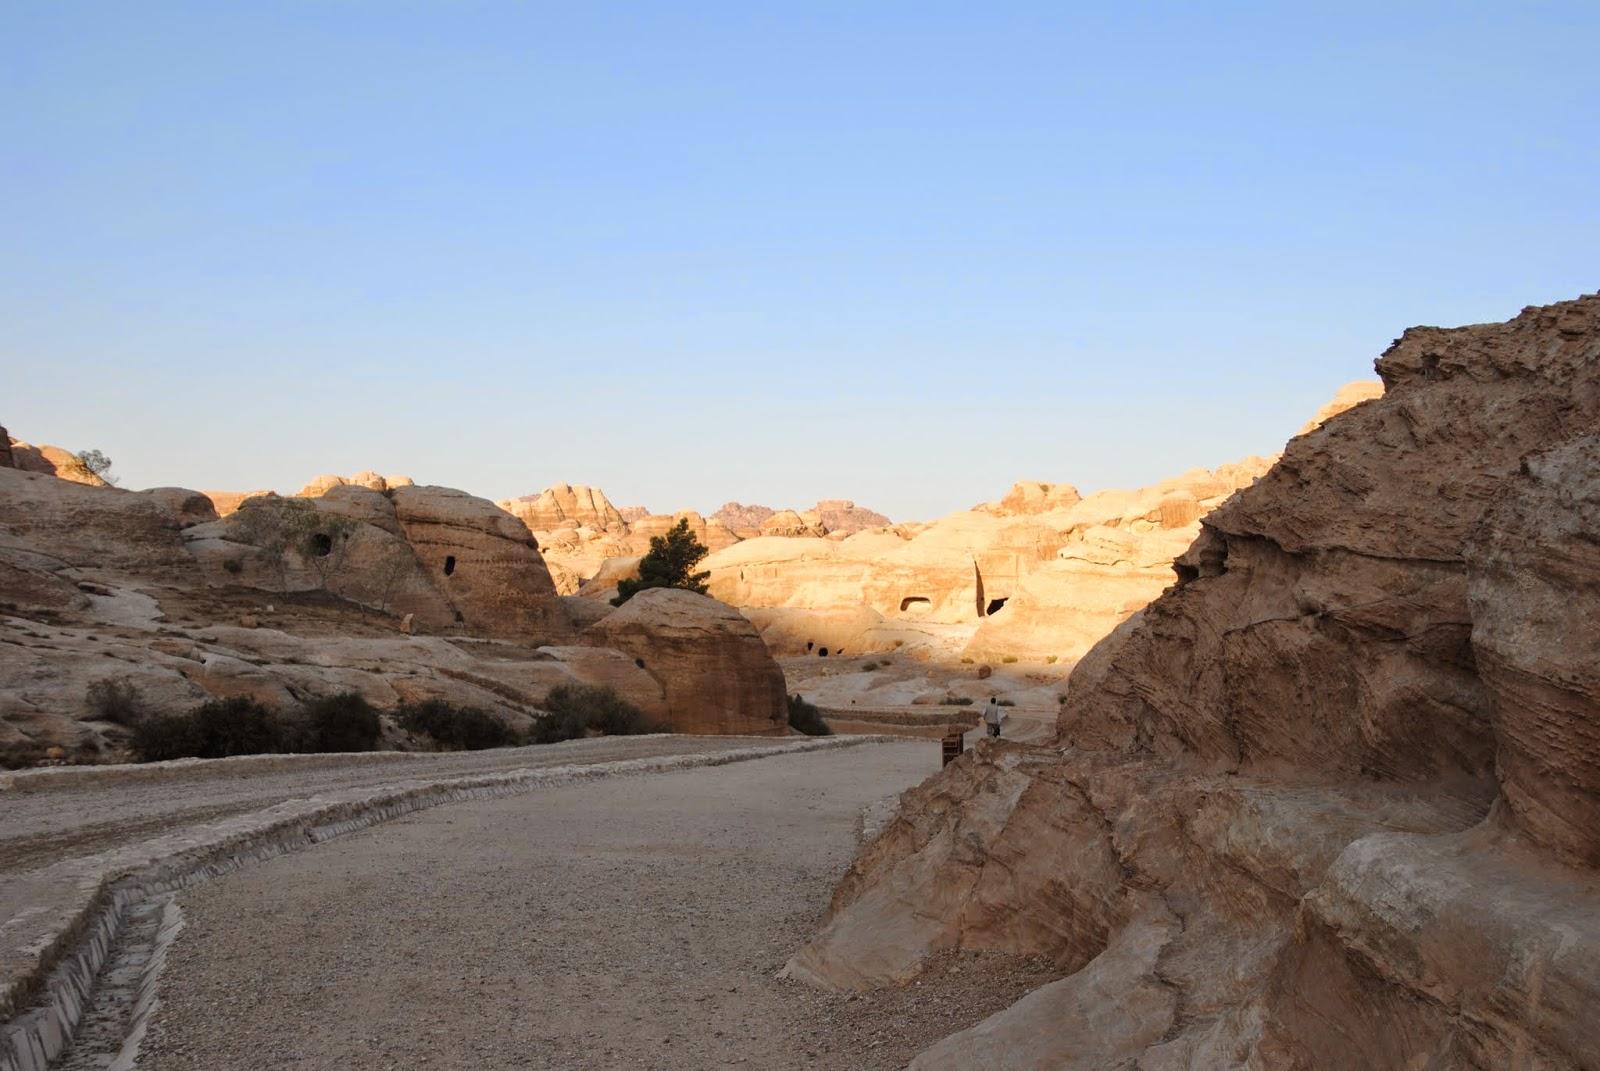 My Photos: Jordan -- Petra -- Entrance, Djin Blocks & Obelisk Tomb